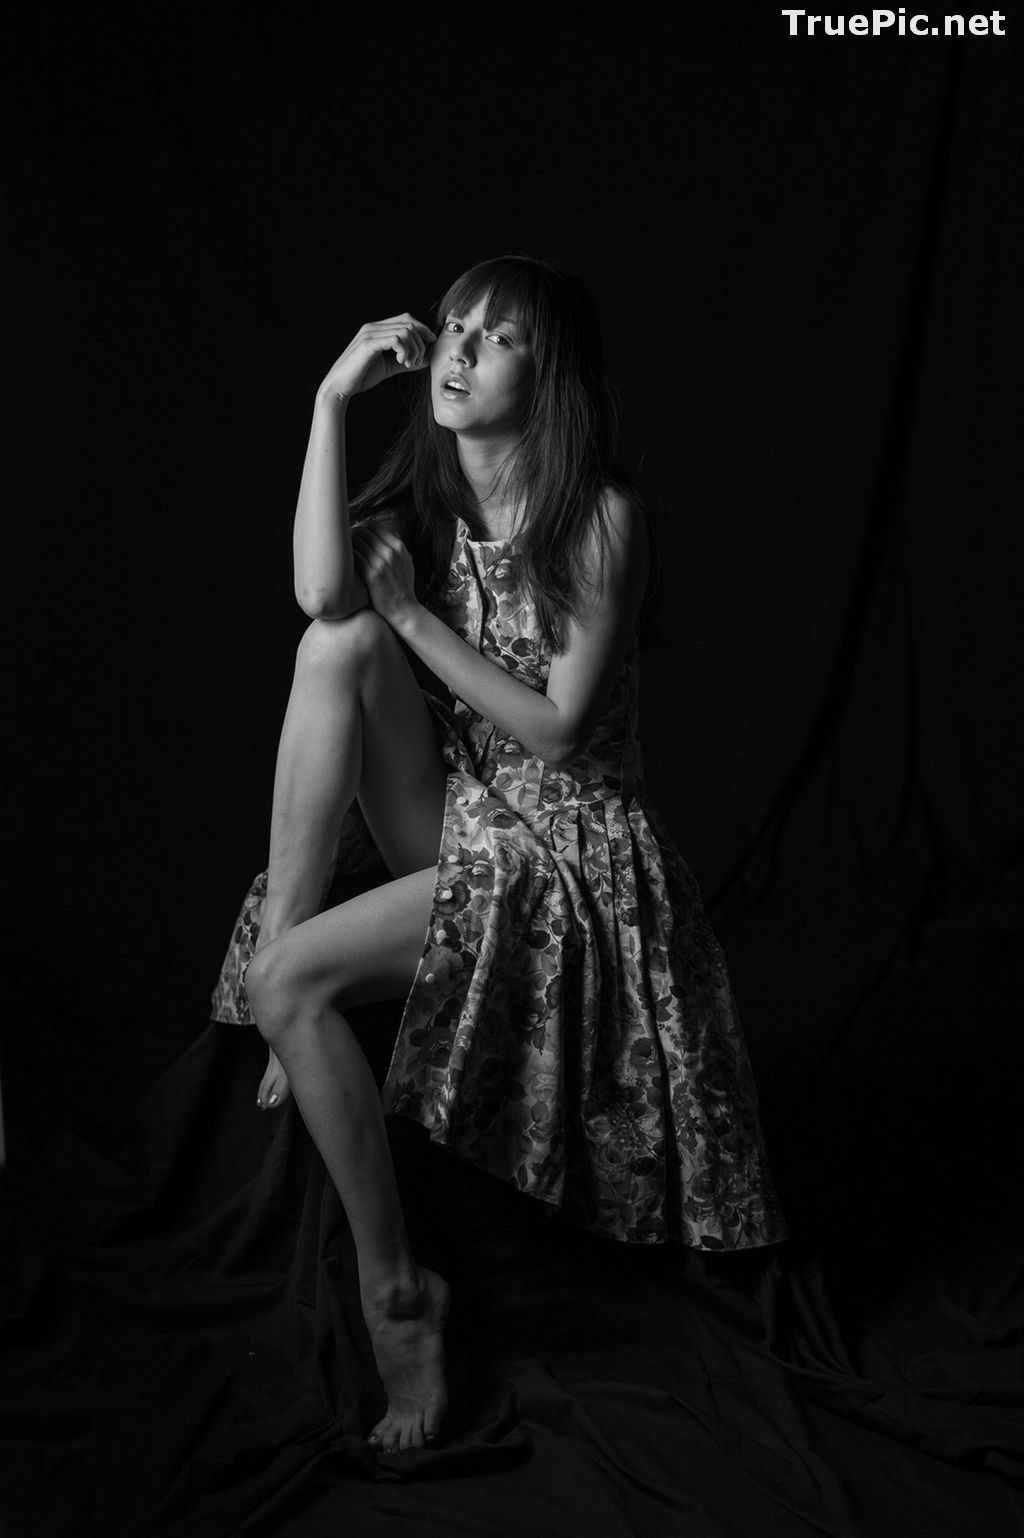 Image Japanese Model and Actress - Yumi Sugimoto - Yumi Mono Chrome - TruePic.net - Picture-3